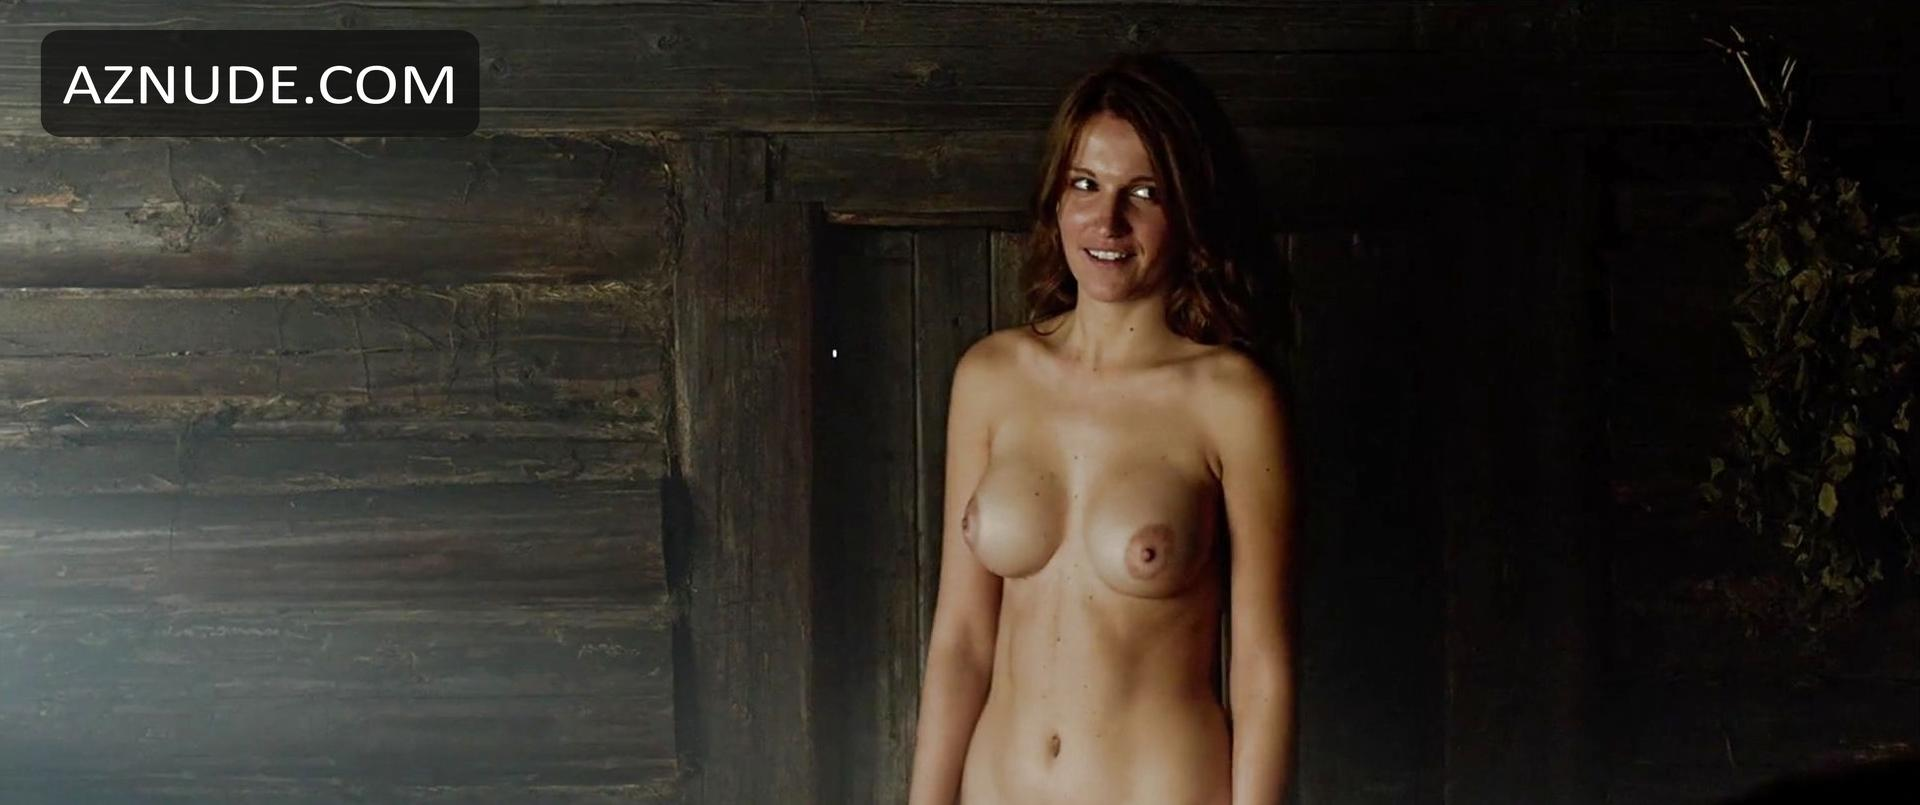 Porn Anastasiya Mikulchina naked (41 photo), Topless, Cleavage, Boobs, panties 2018